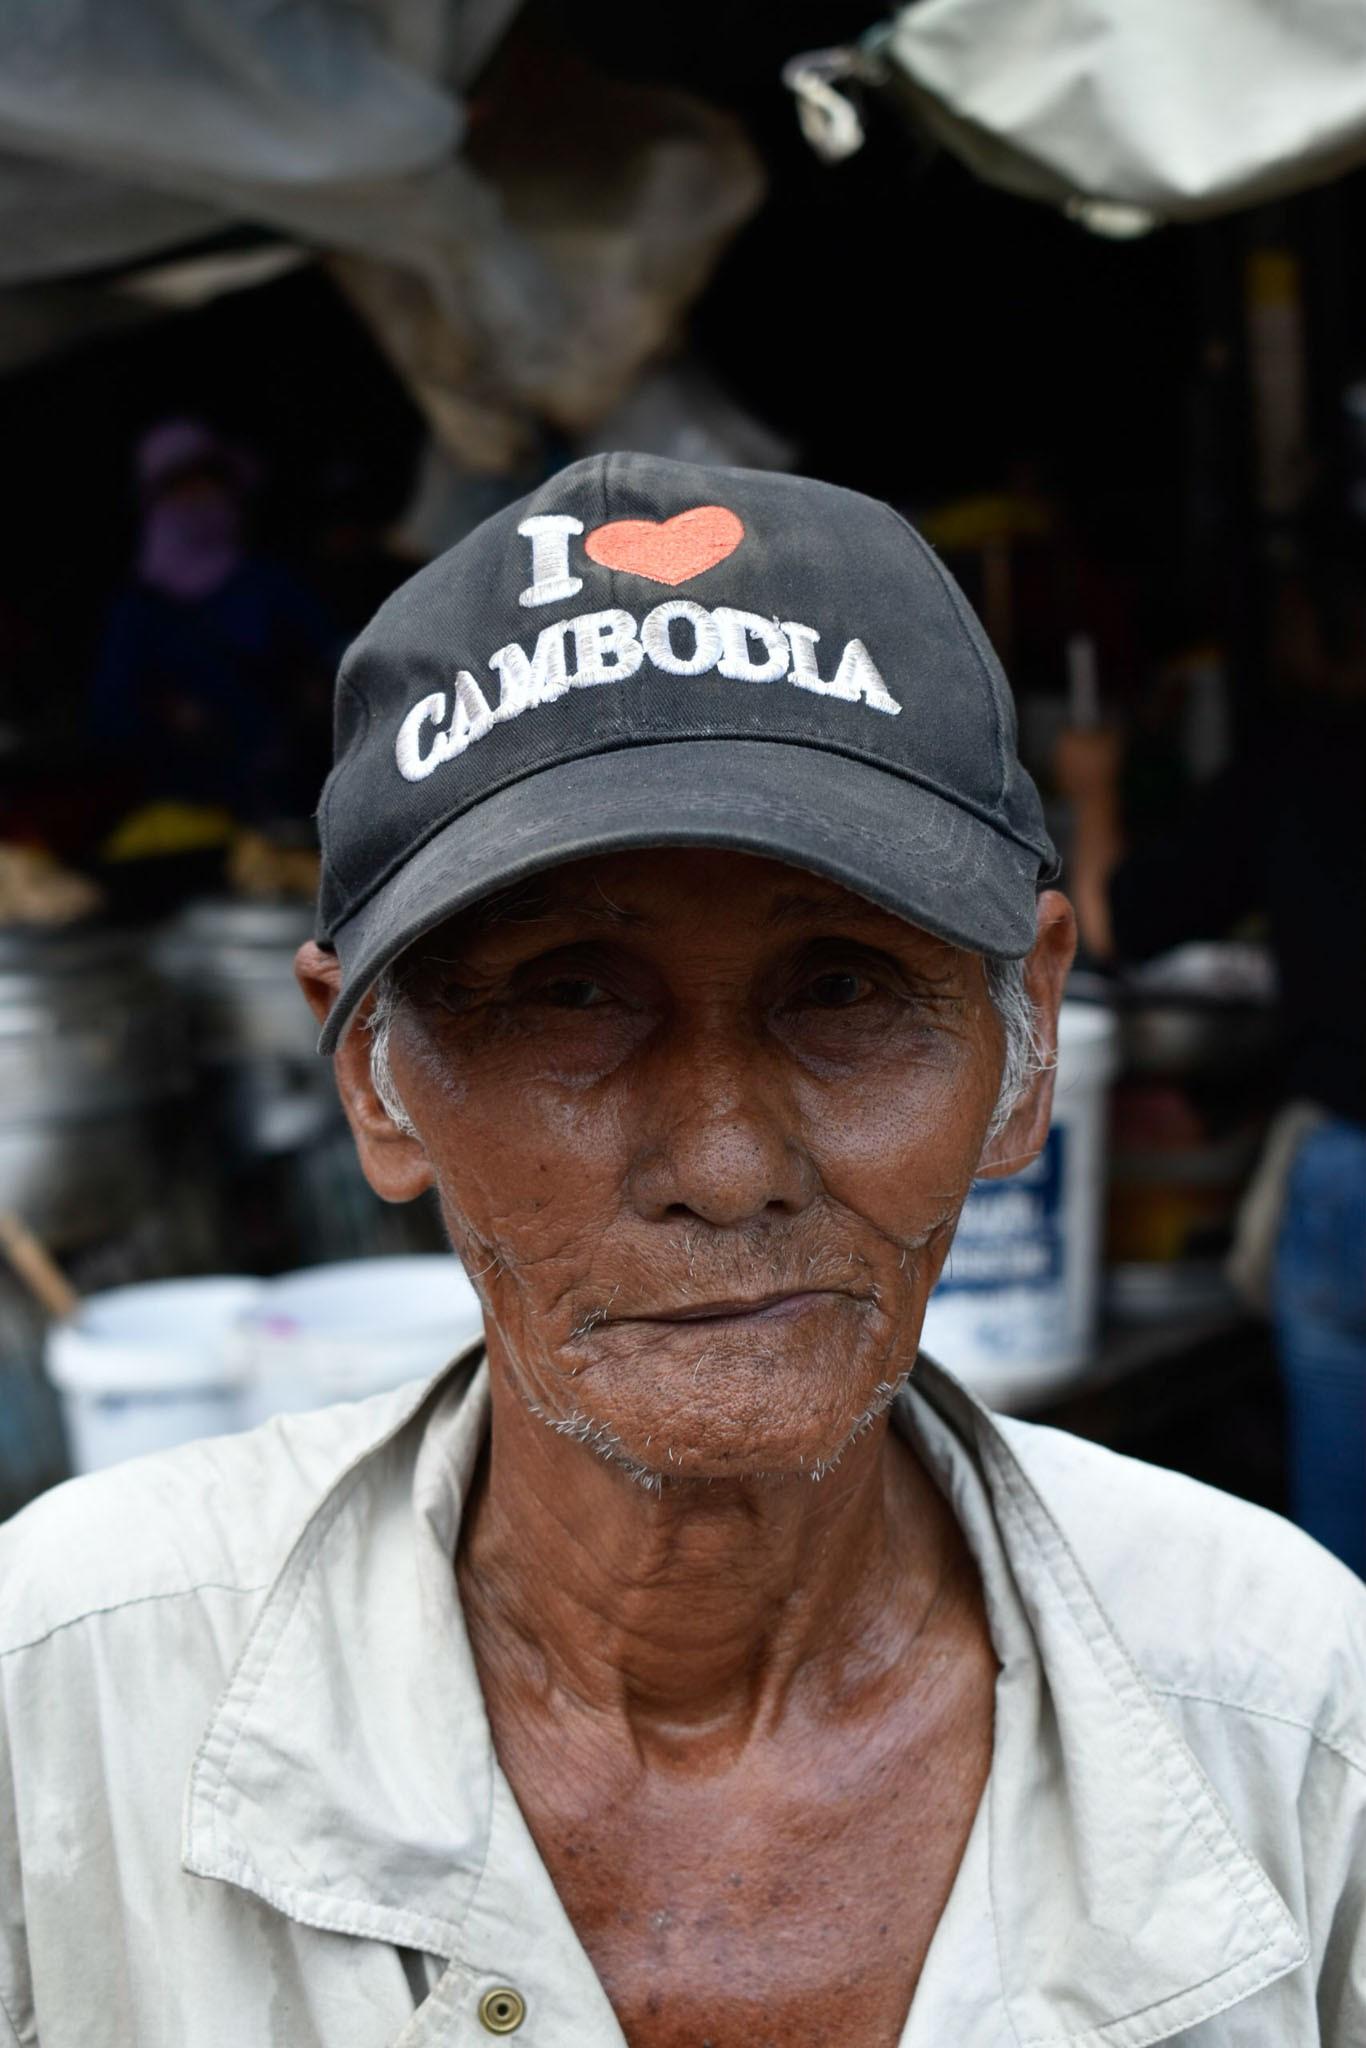 i-hou-van-cambodia